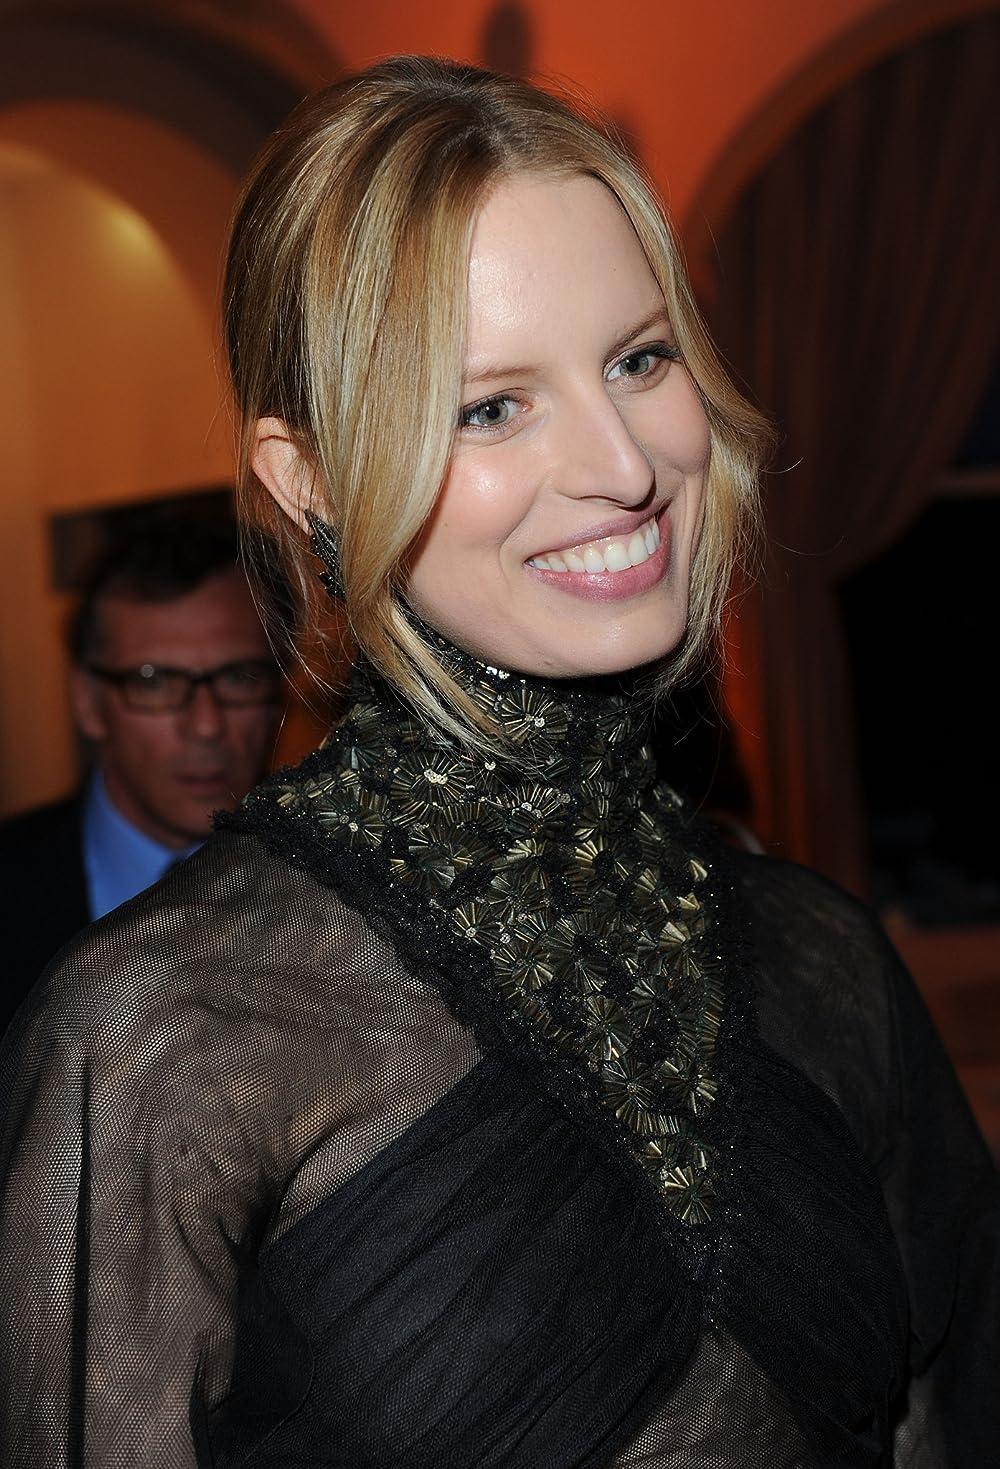 The Hottest Photos Of Of Karolina Kurkova - 12thBlog